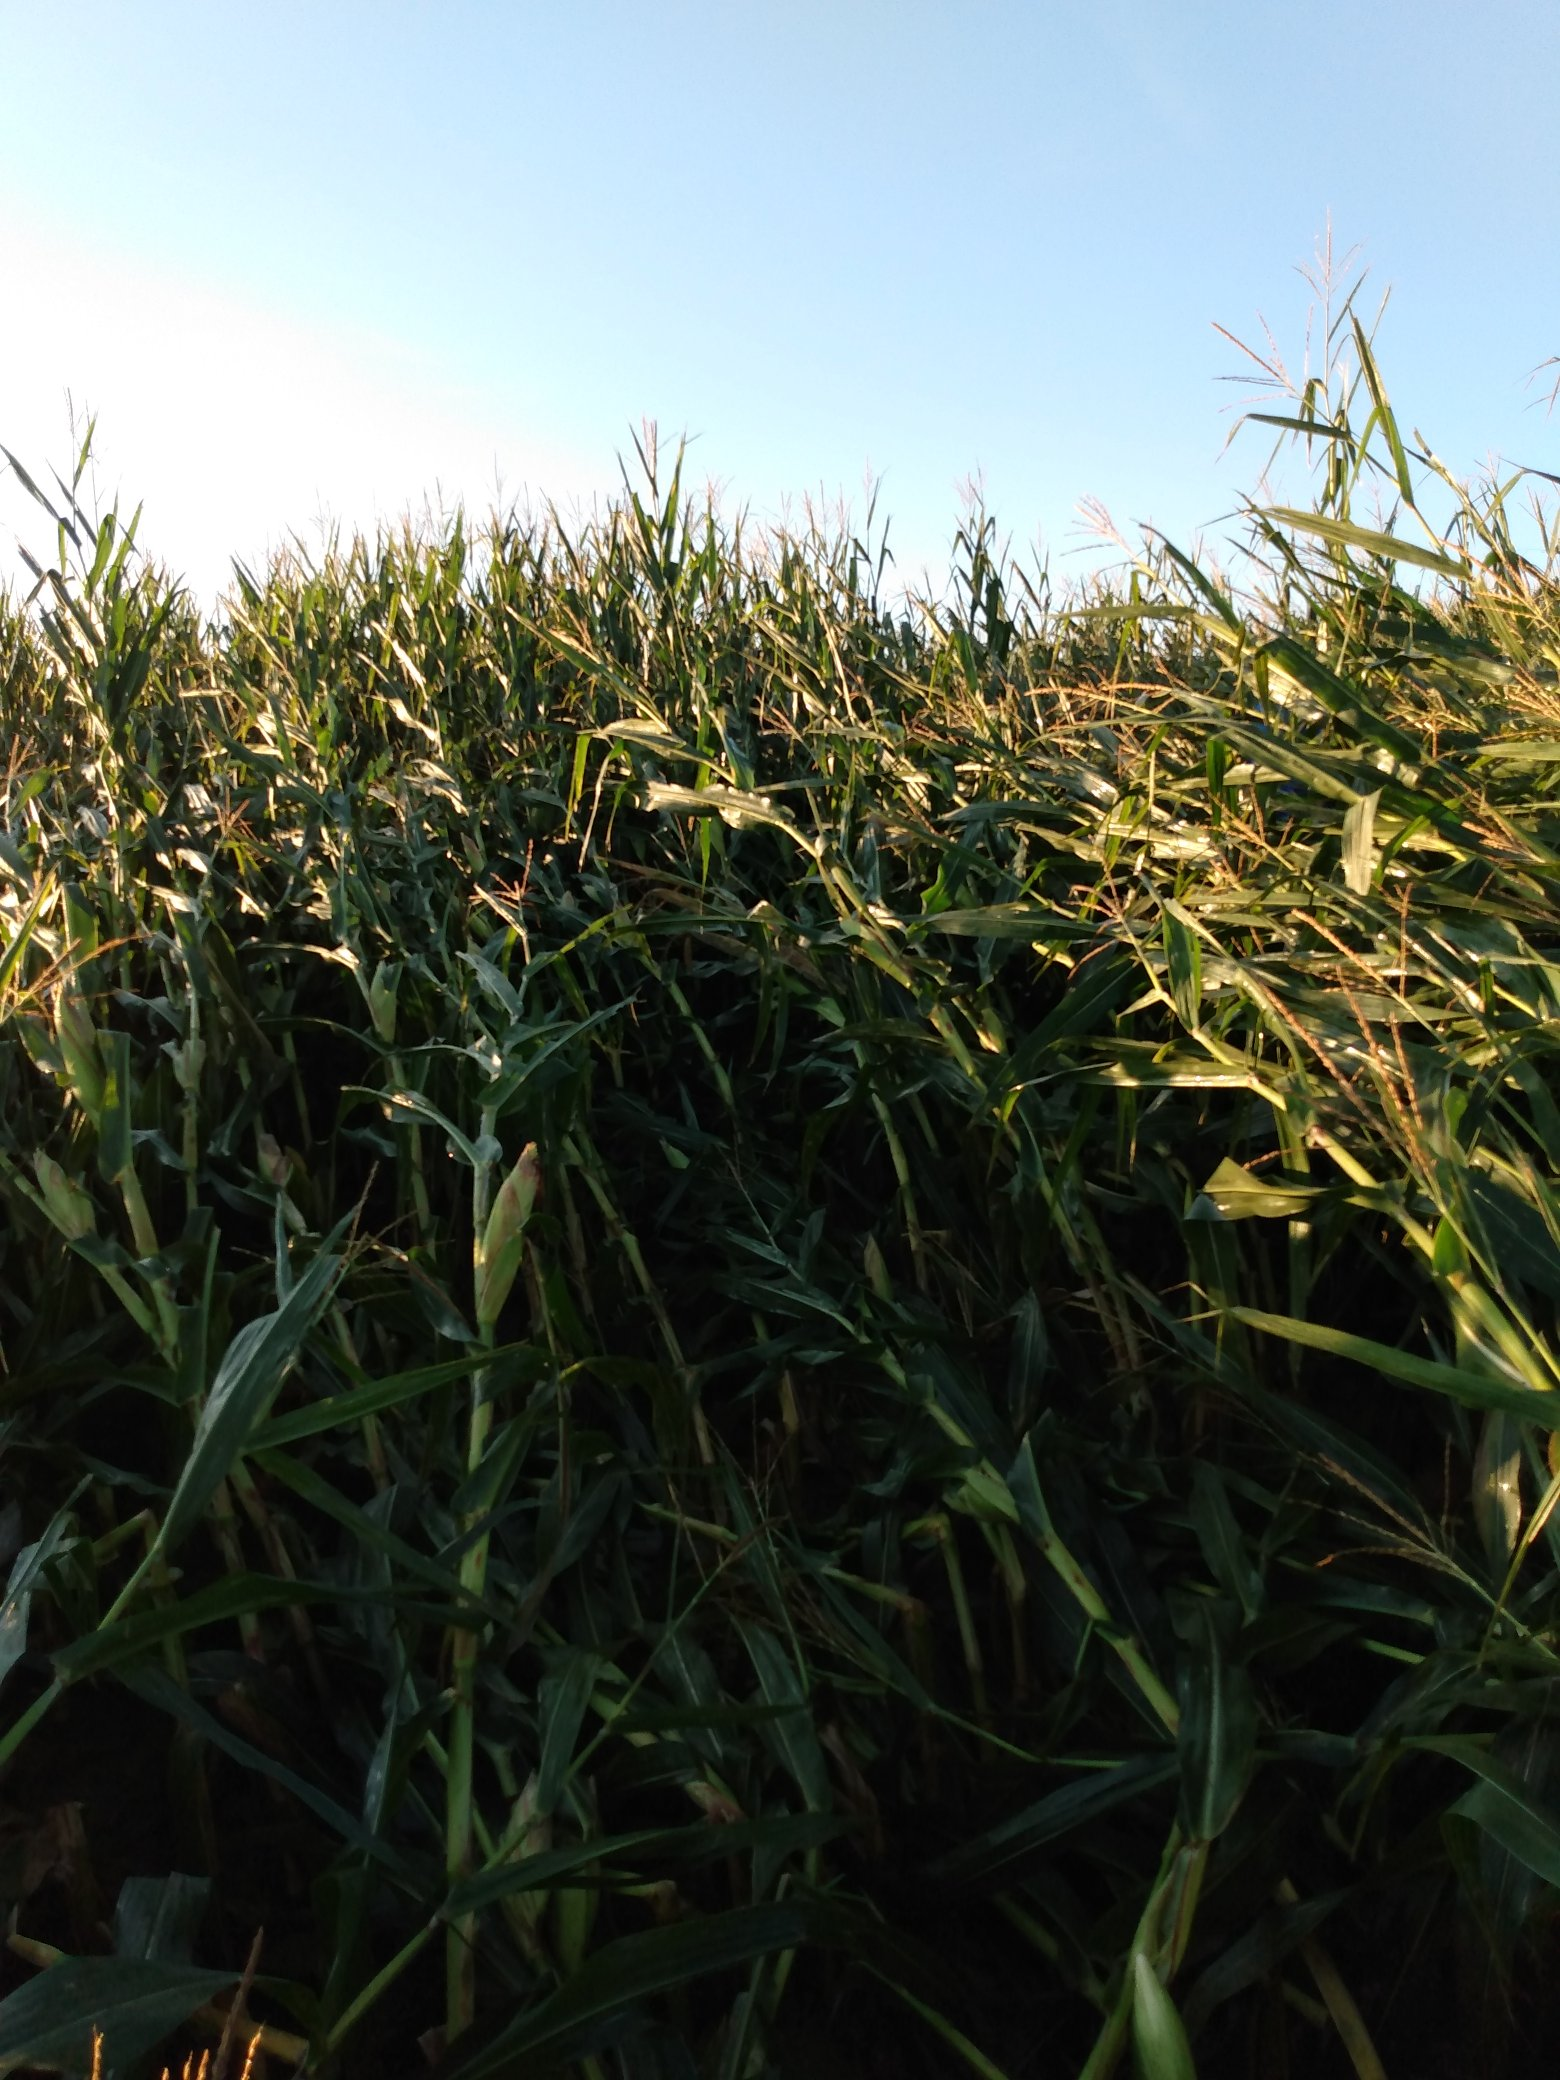 Milho Iowa - Pro Farmer 2020 - Foto: Joel Shoup